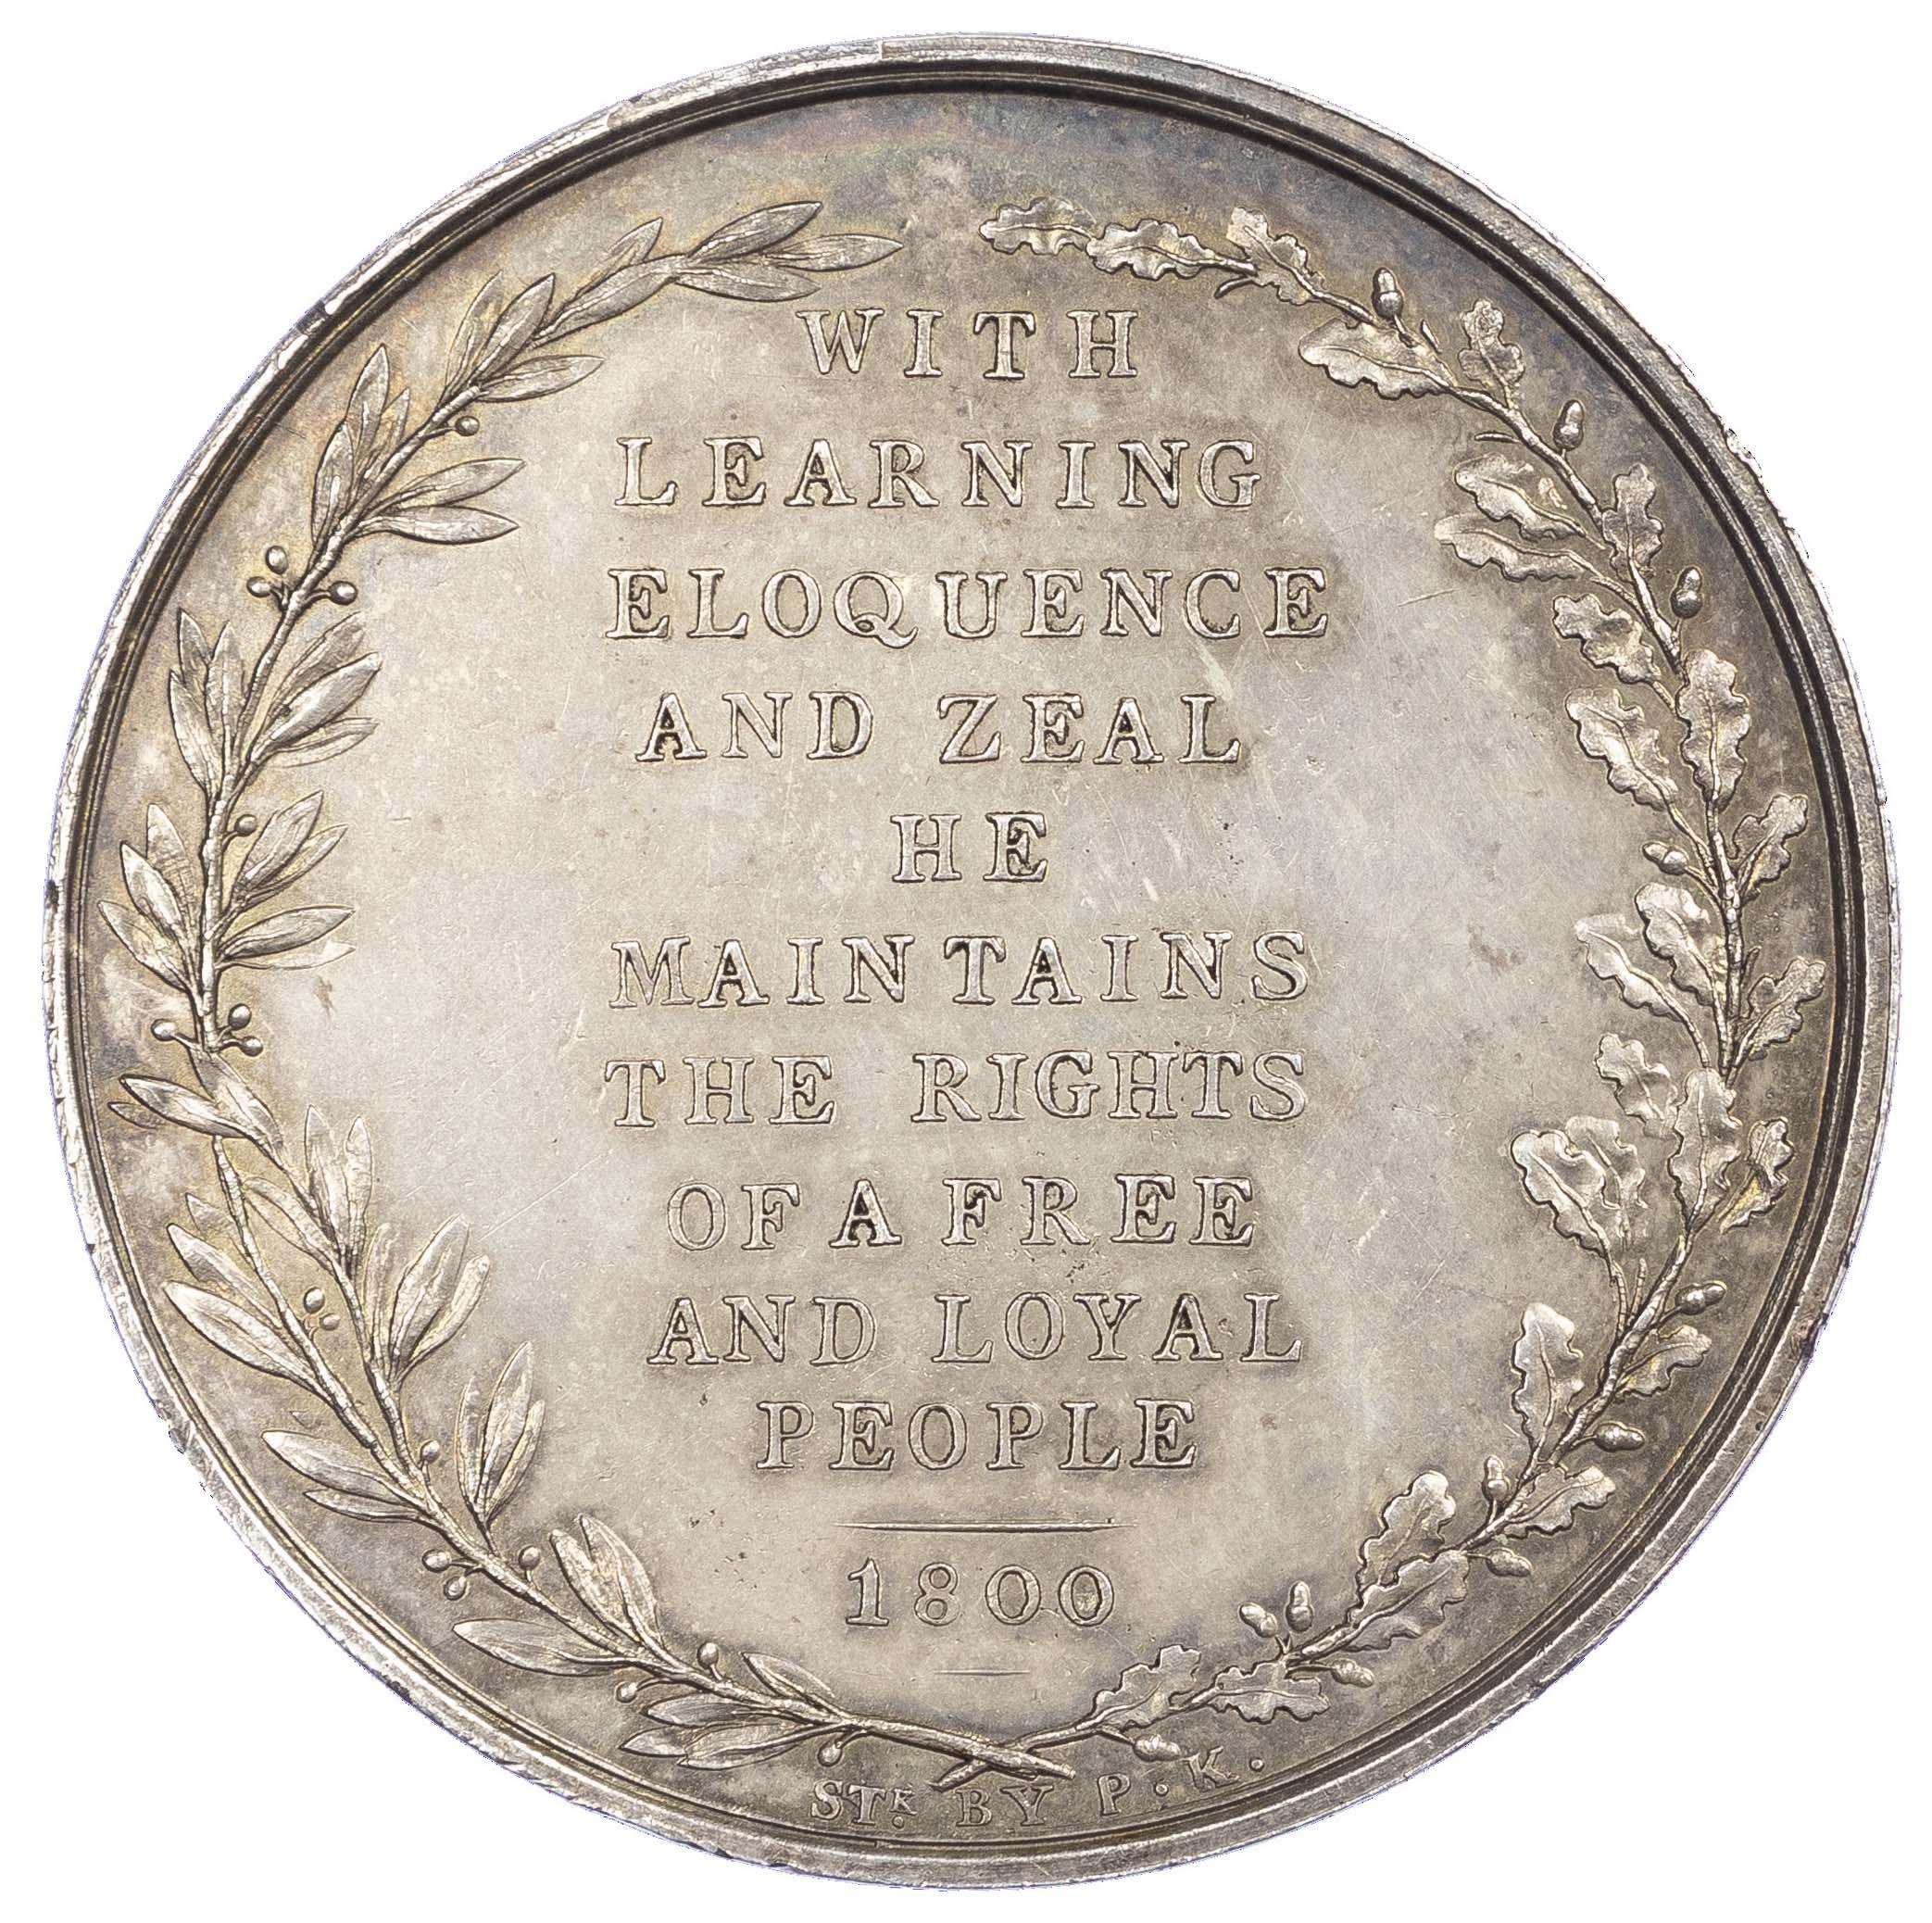 Ireland ? George III, Whig statesman, silvered AE medal 1800